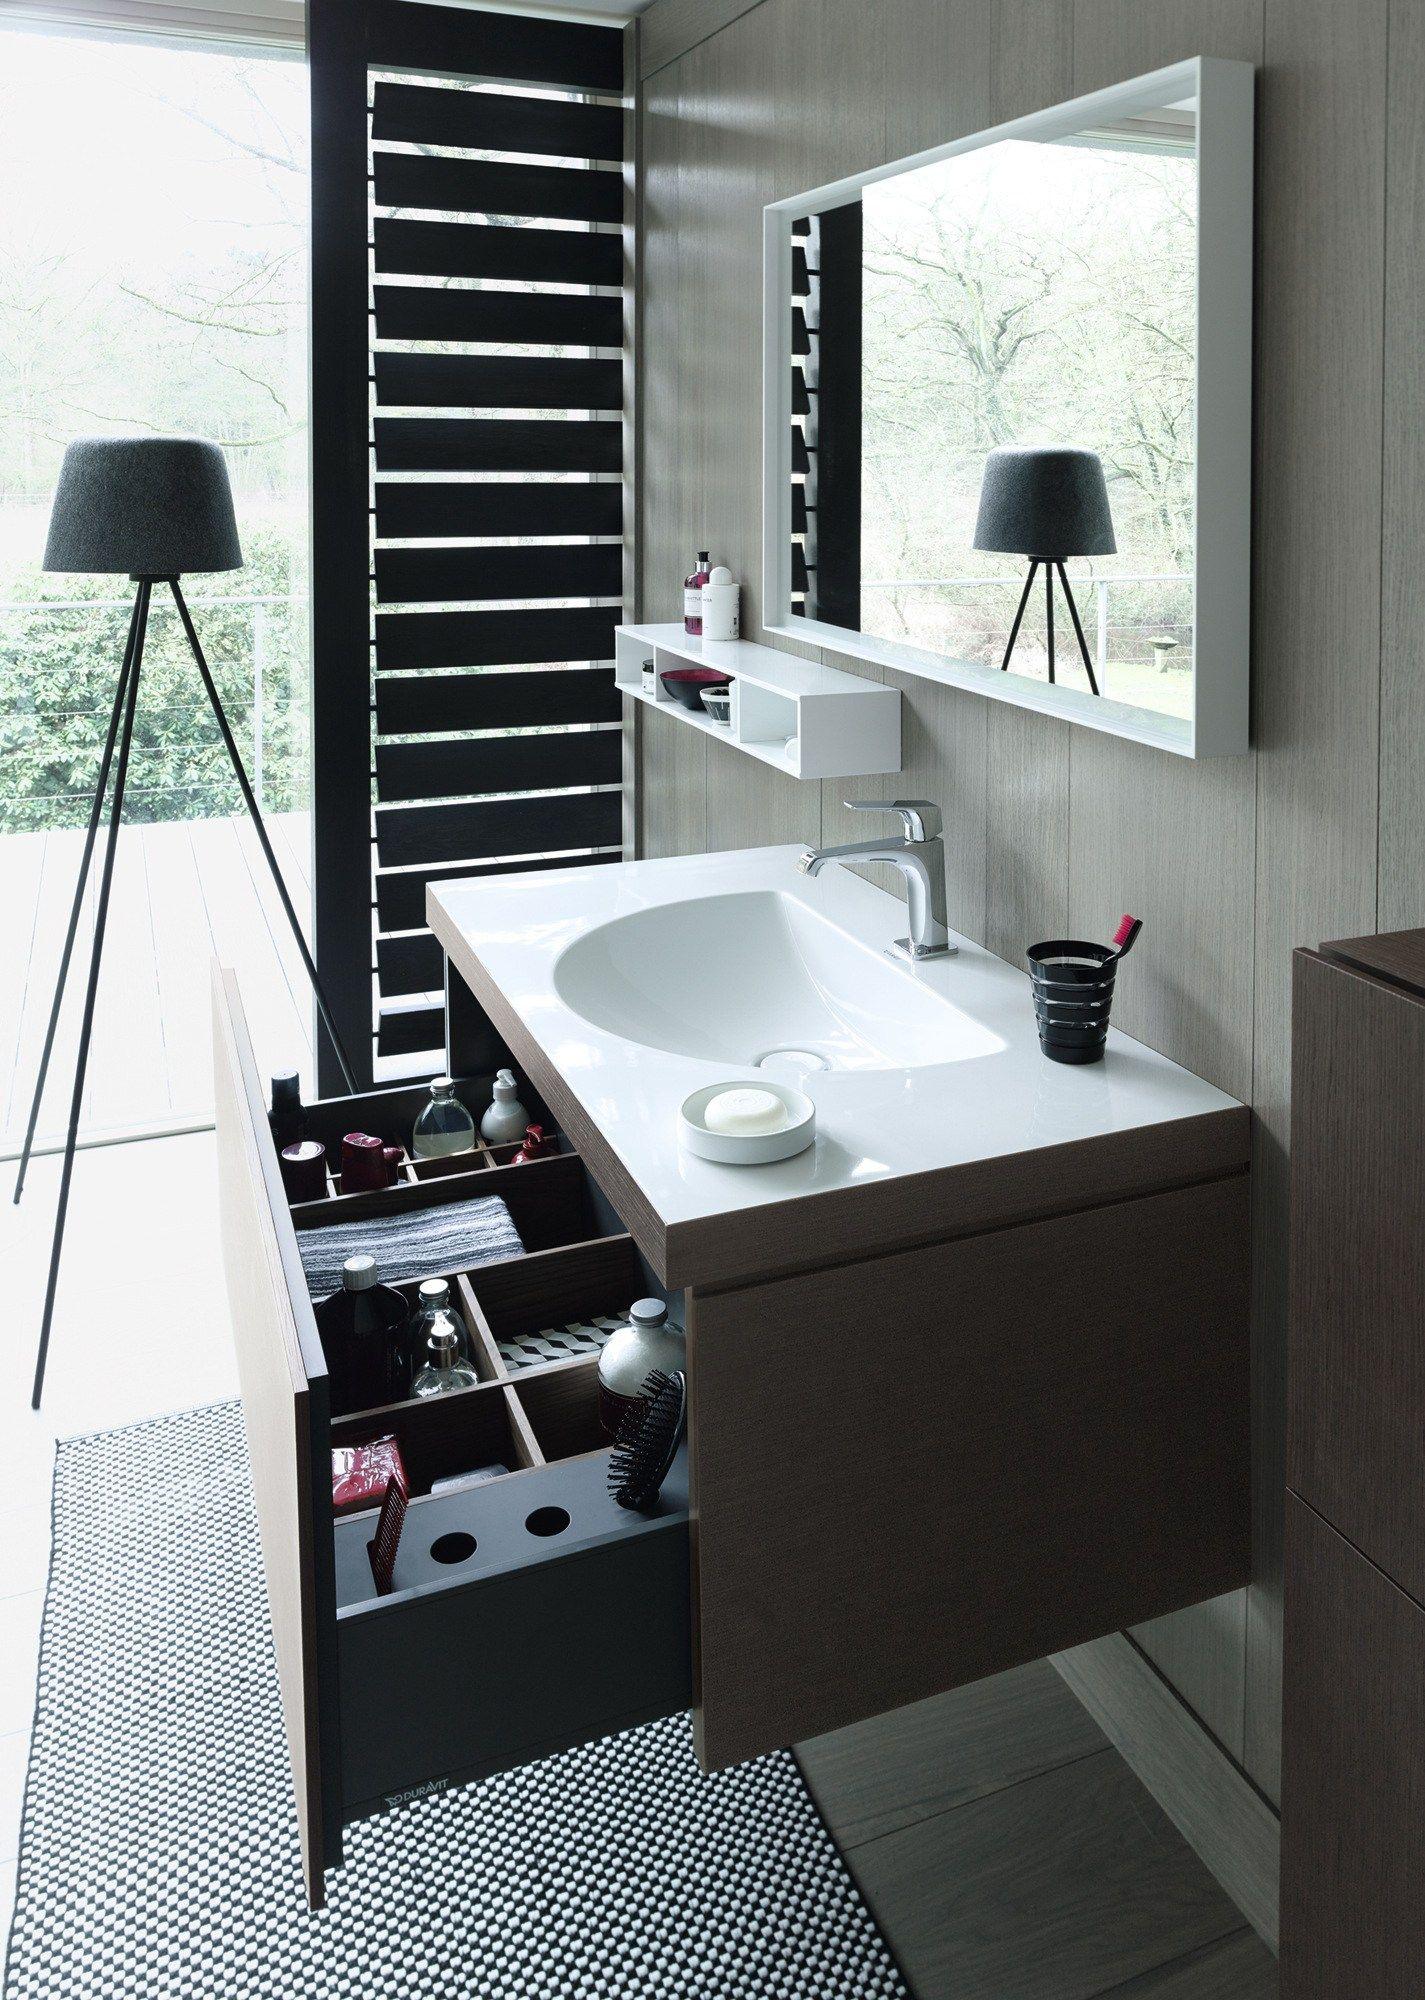 l cube c bonded mobile lavabo sospeso by duravit design. Black Bedroom Furniture Sets. Home Design Ideas